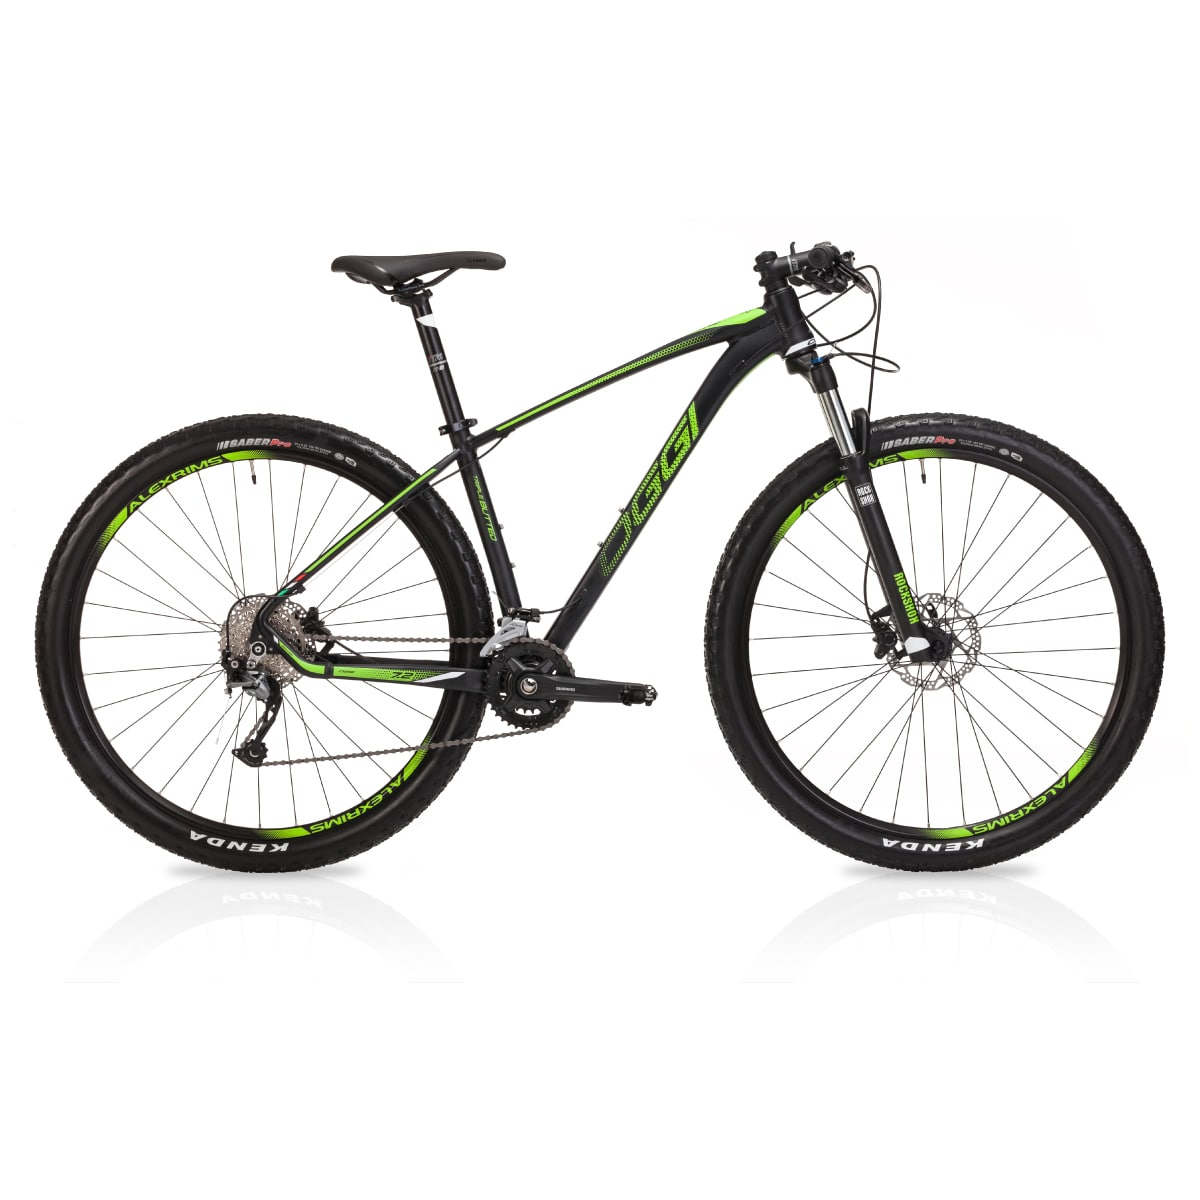 Bike Oggi 7.2 2019 Big Wheel Shimano Alivio Preto Verde